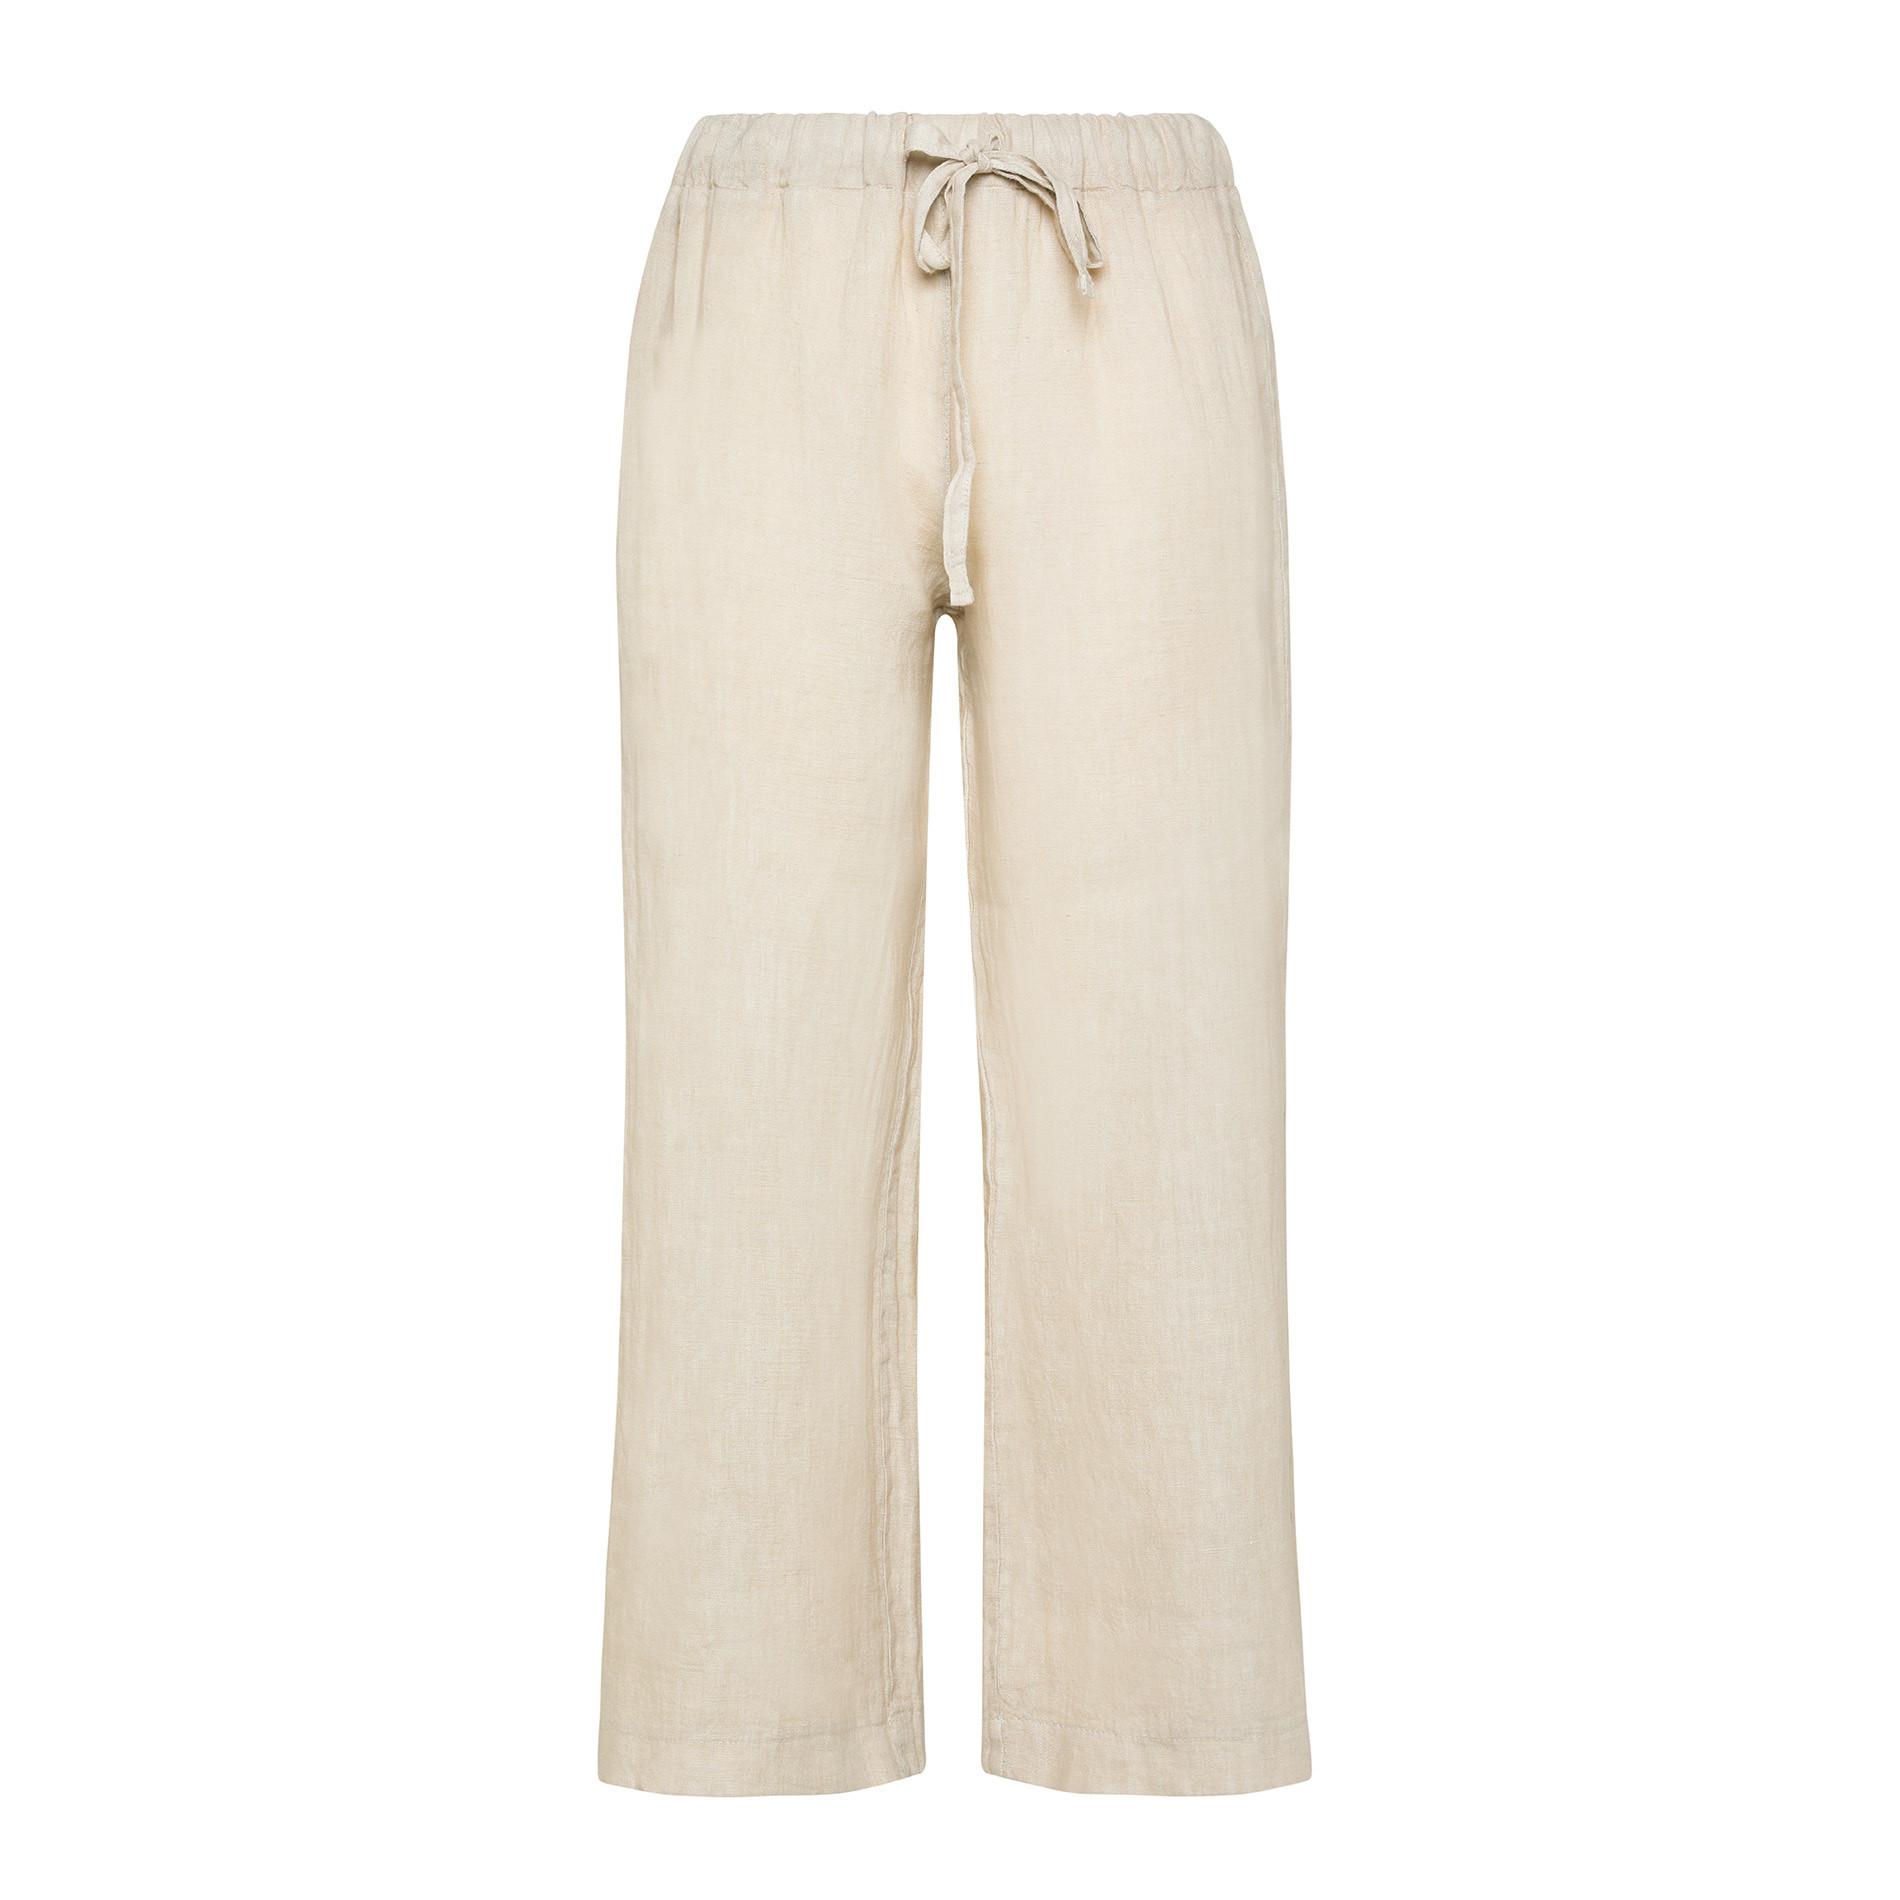 Pantalone ampio in puro lino tinta unita, Beige, large image number 0